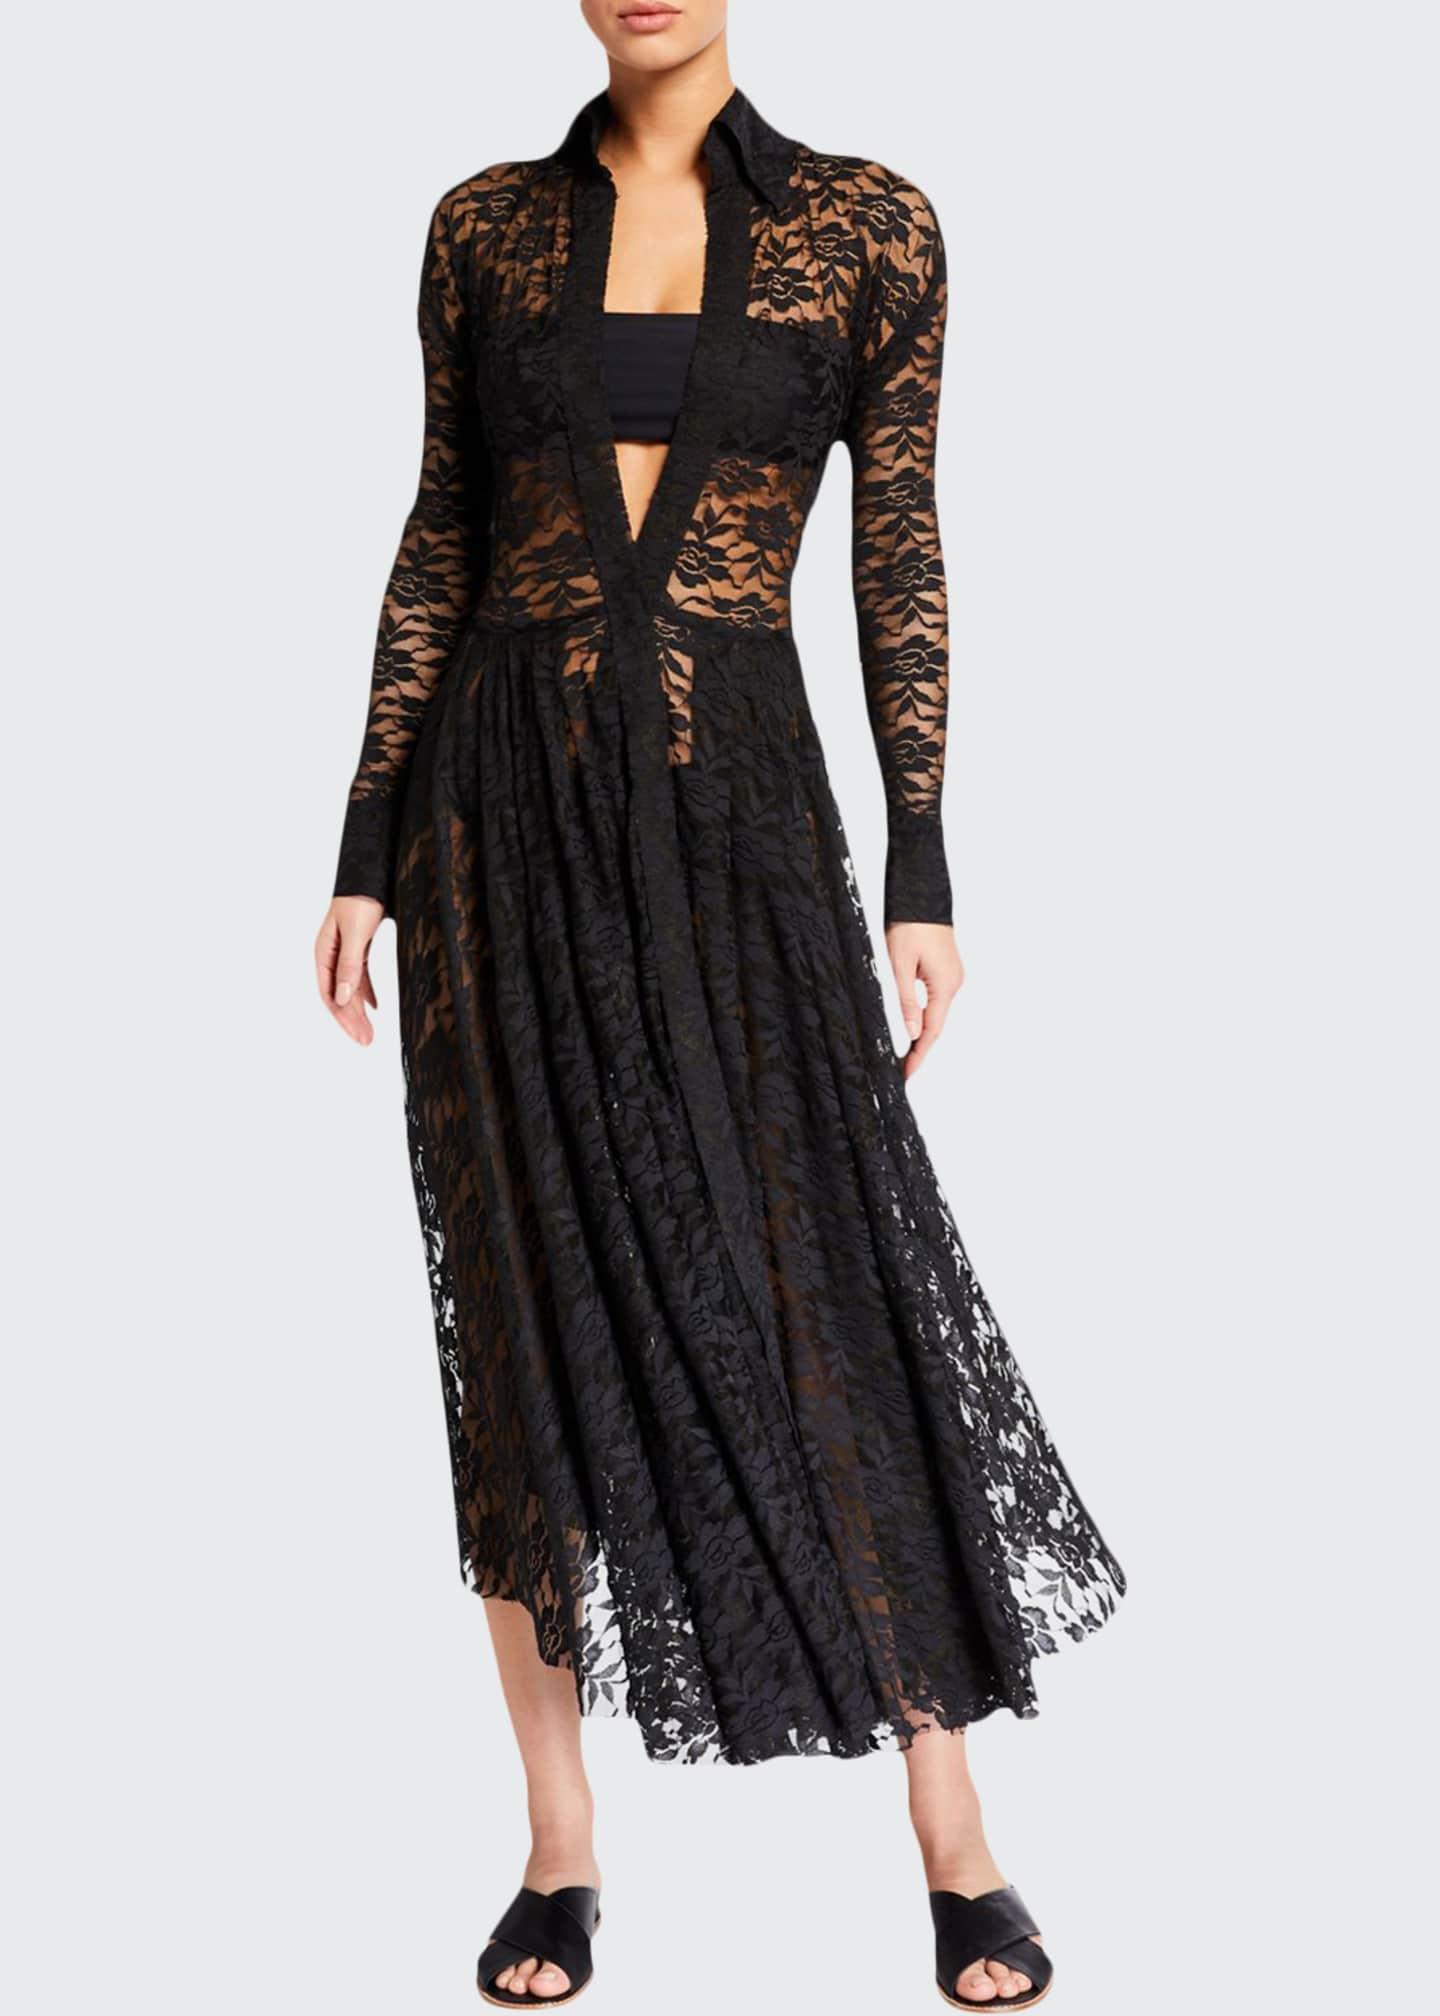 Norma Kamali Flared Lace Long-Sleeve Coverup Dress